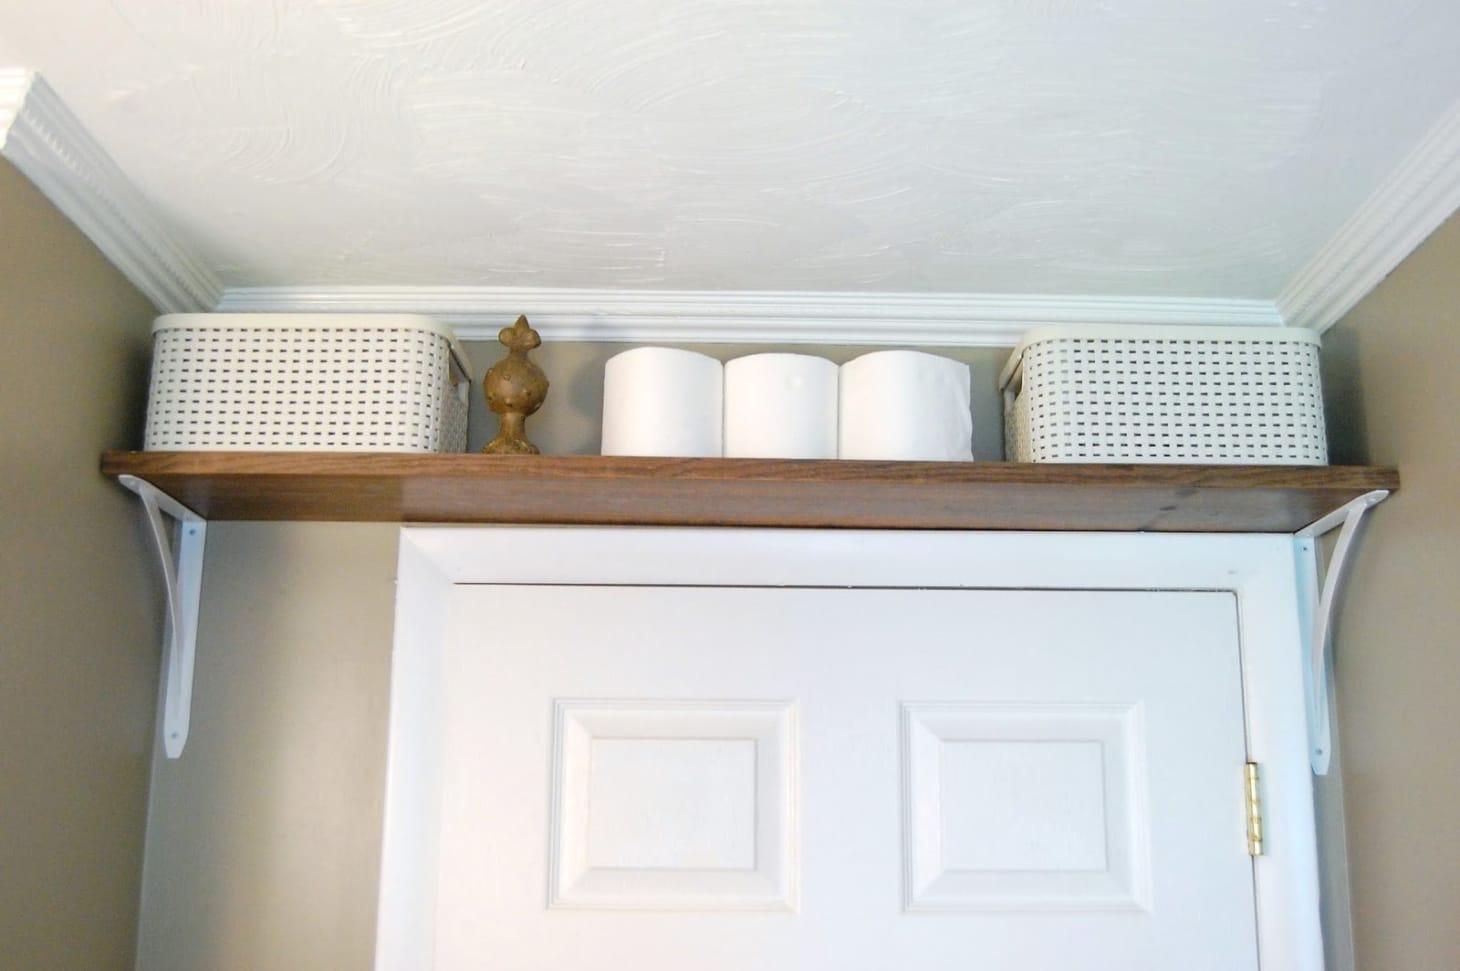 Bathroom Storage Ideas - Storage For Small Bathrooms ... on Small Apartment Bathroom Storage Ideas  id=98189